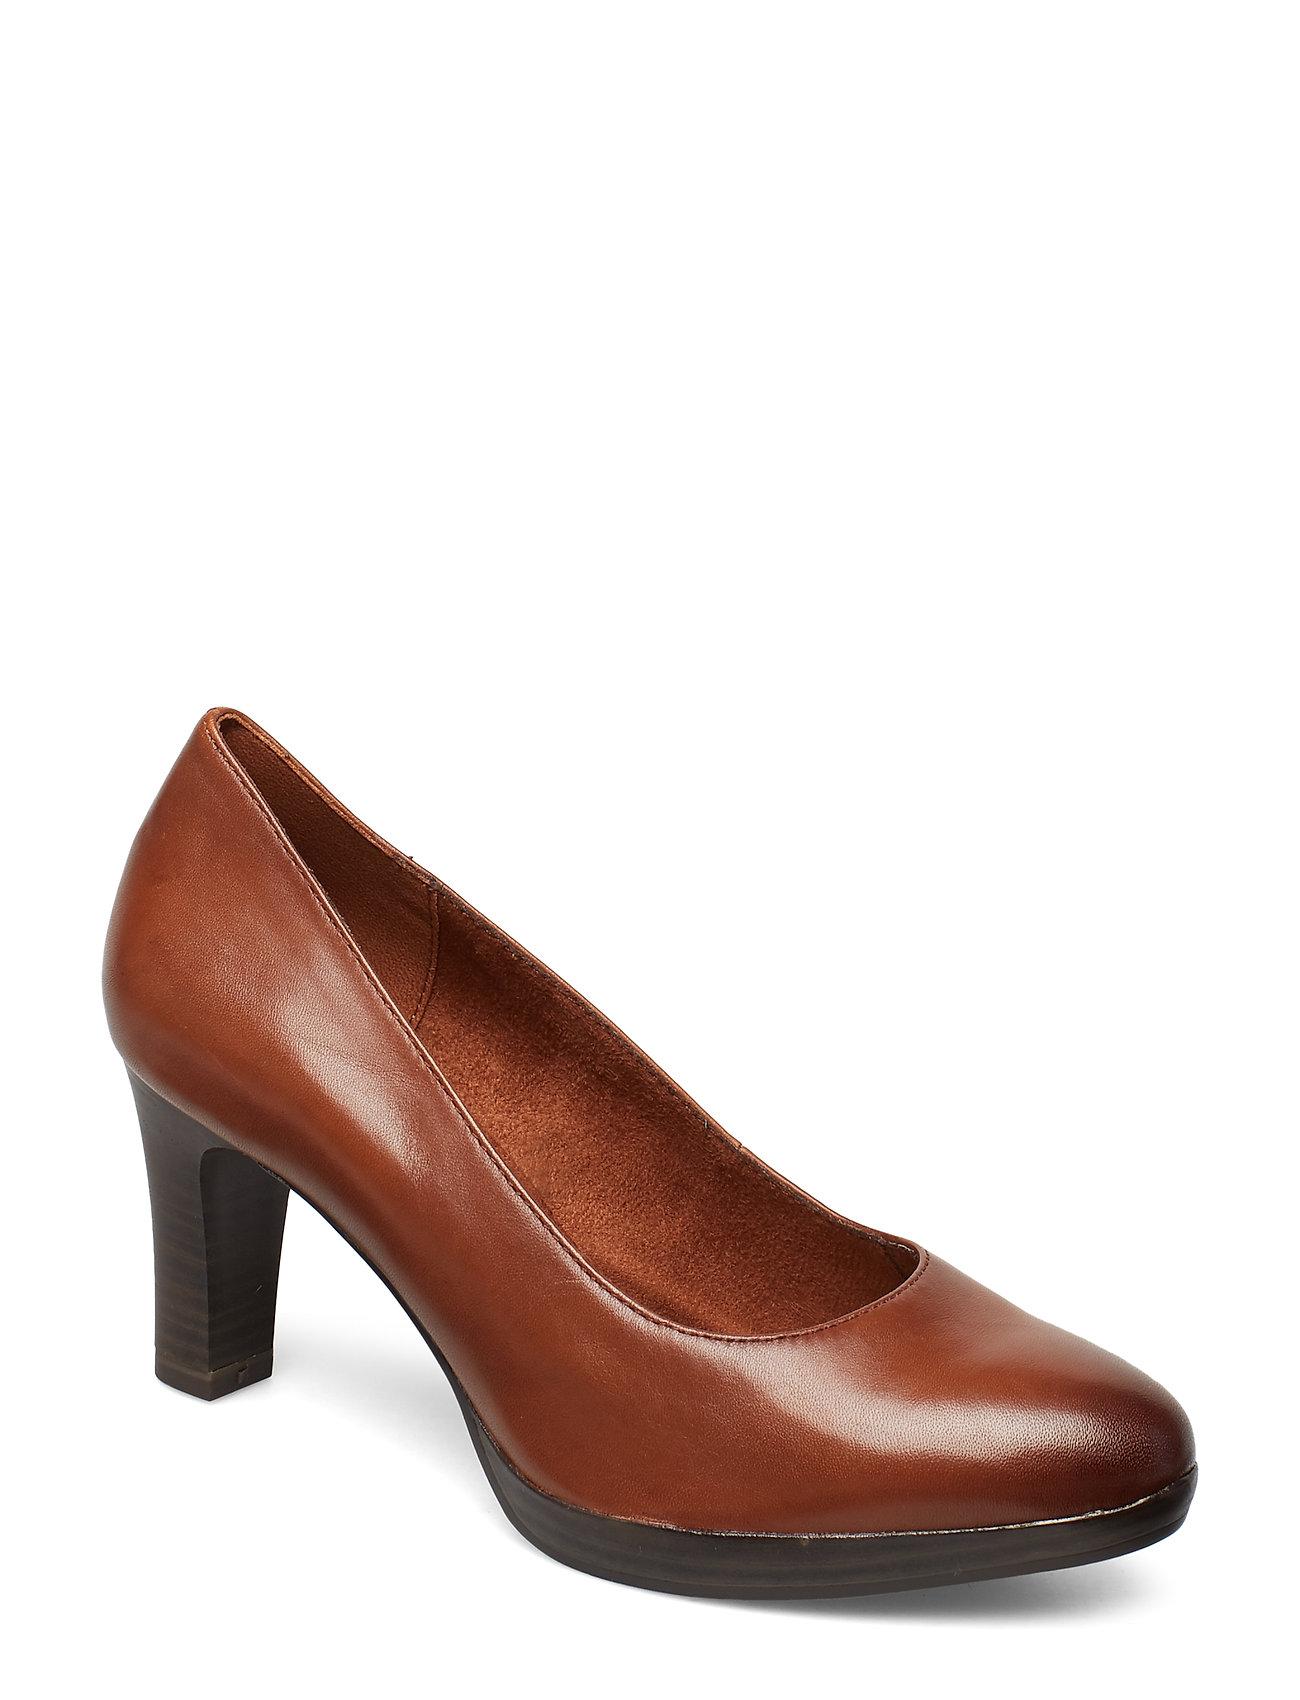 Tamaris Woms Court Shoe - COGNAC